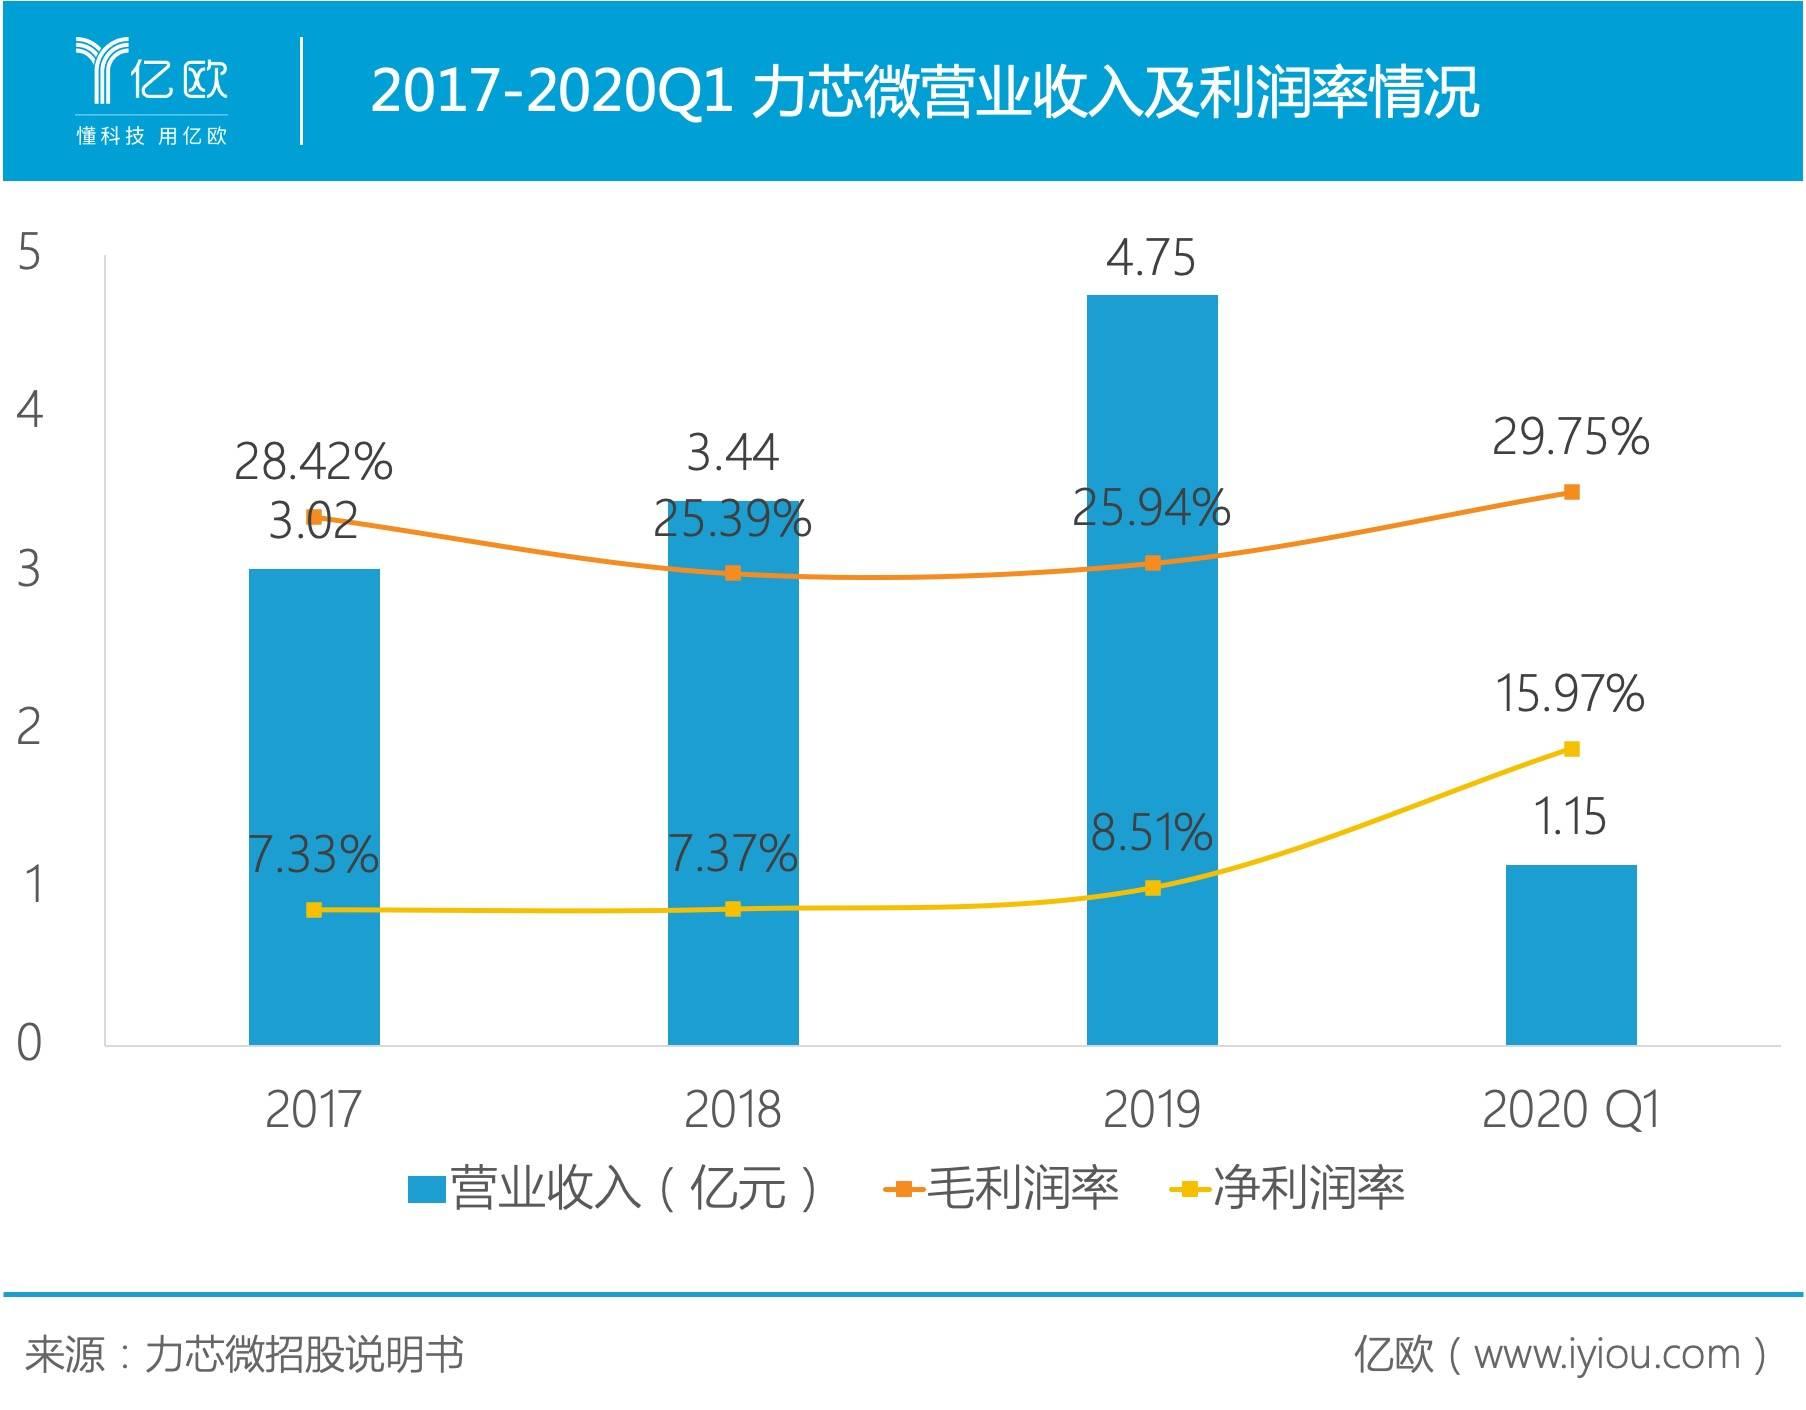 2017-2020Q1 力芯微营业收入及利润率情况.PNG